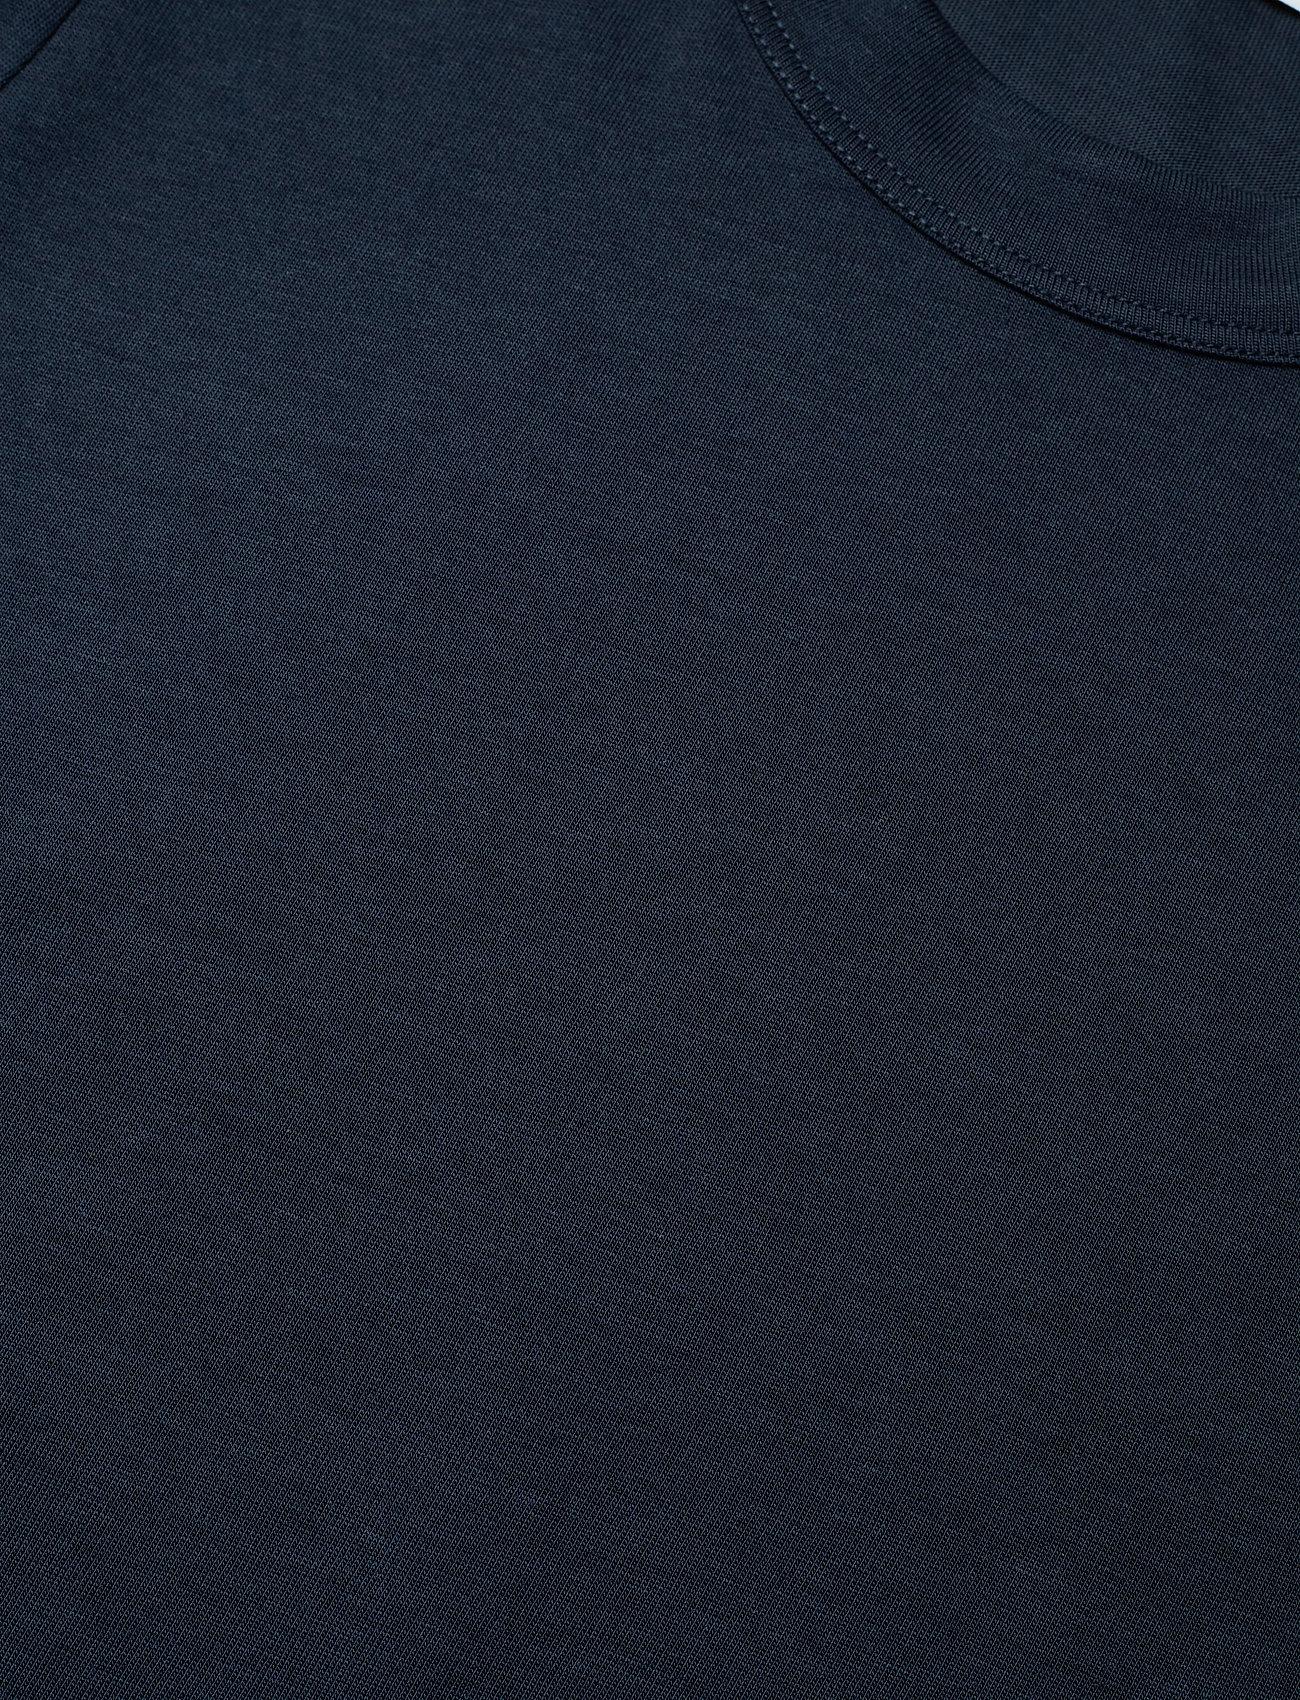 RODEBJER - RODEBJER DORY - t-shirts - navy - 2